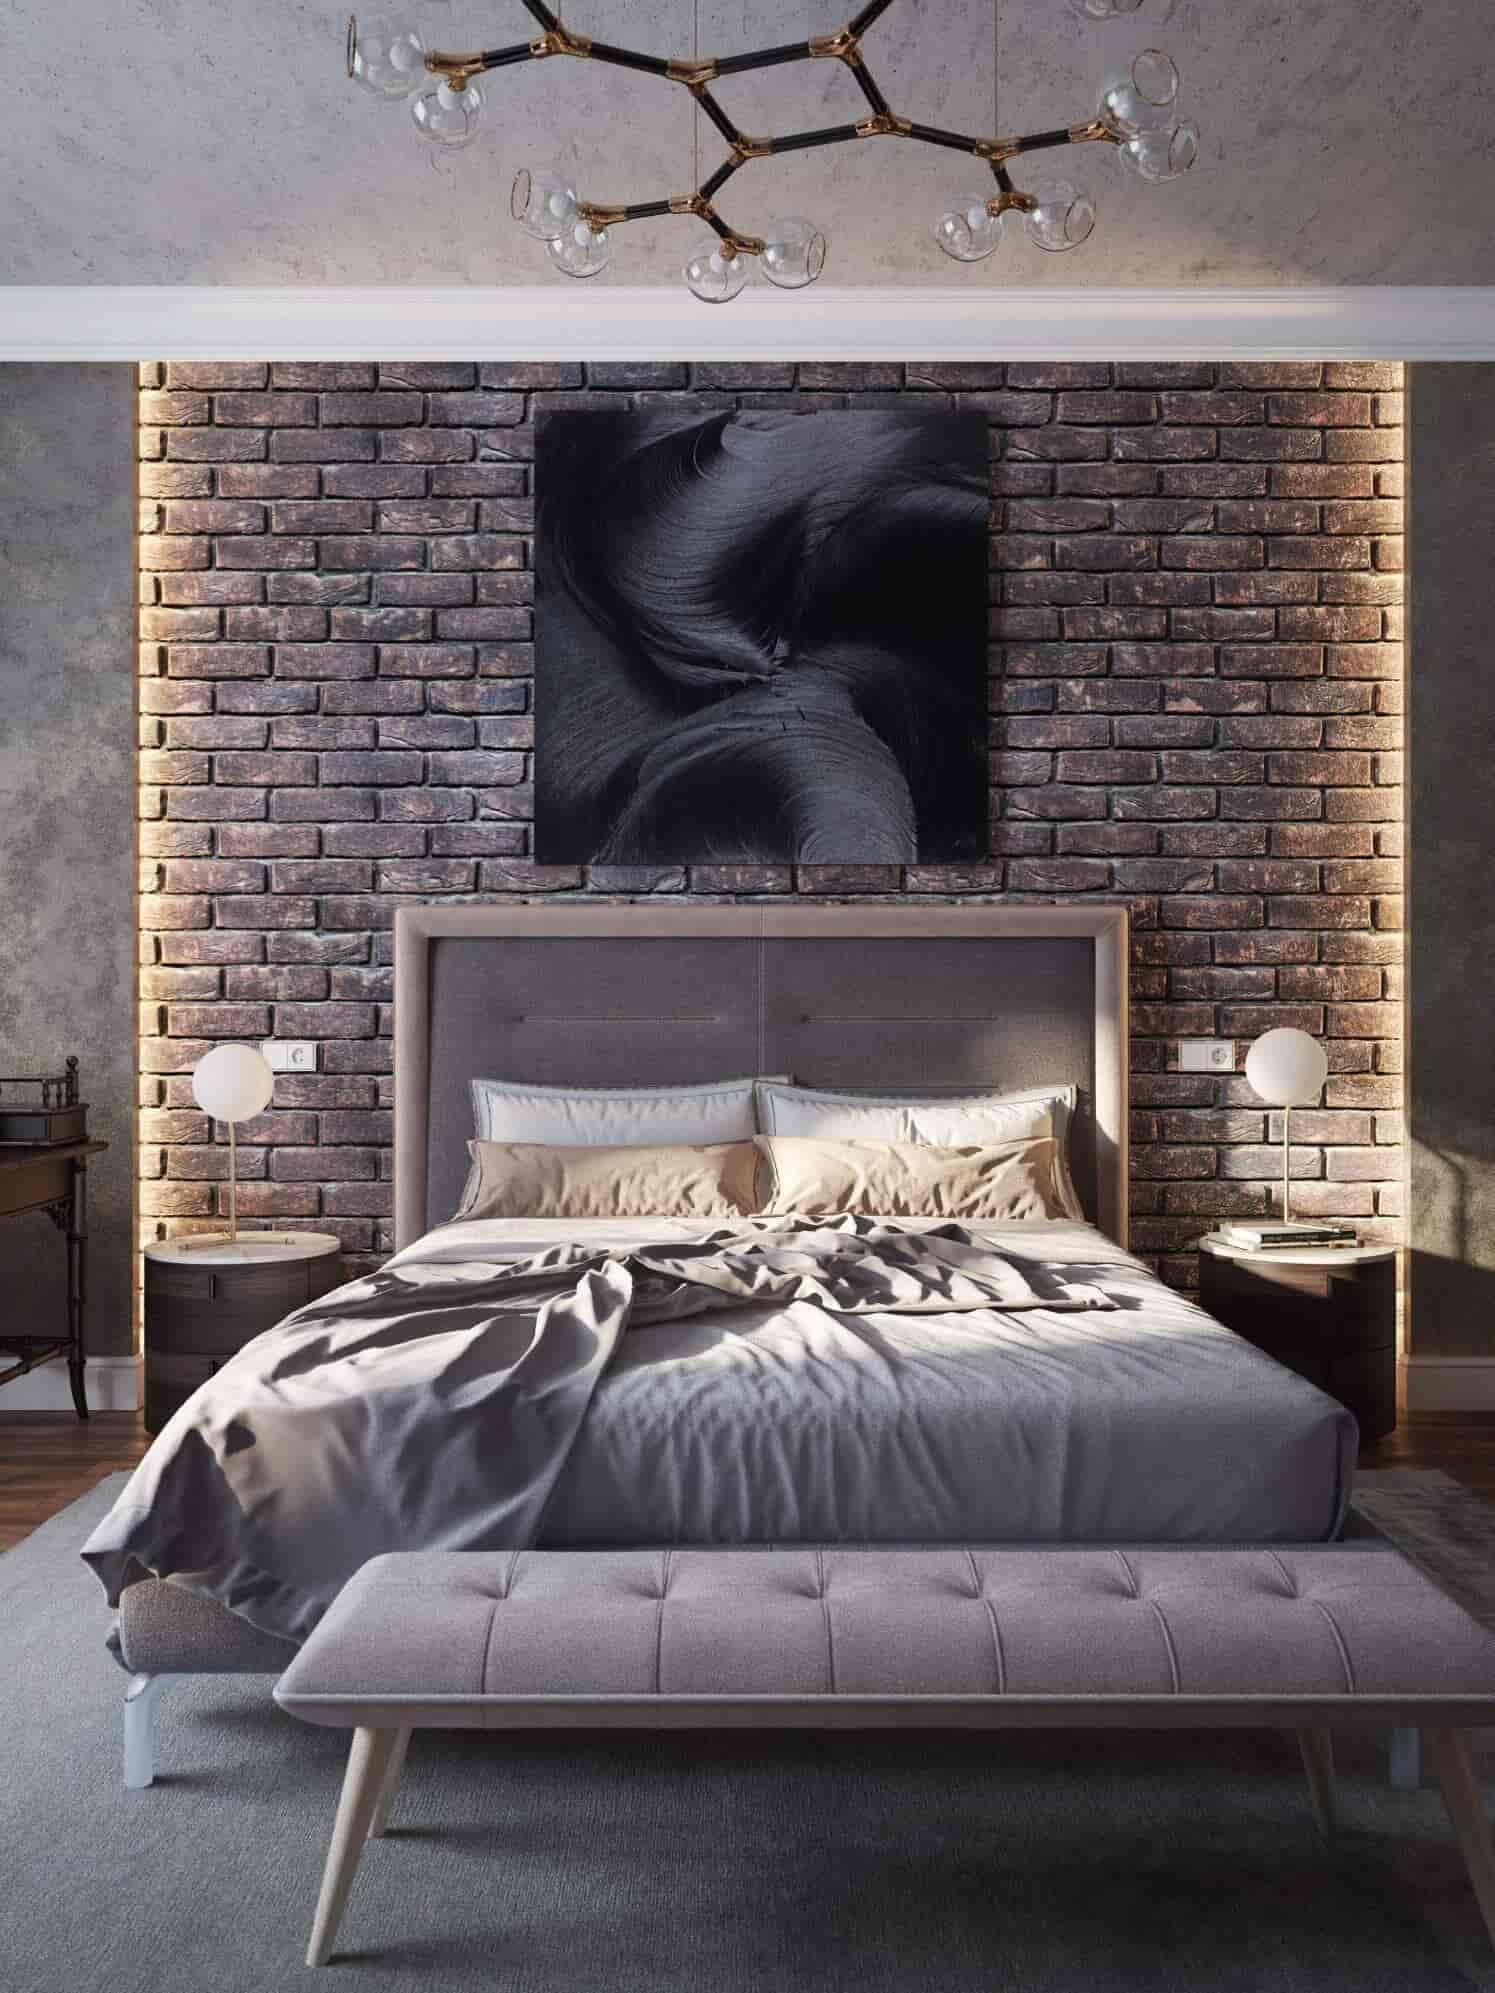 Small bedroom lighting designs 14